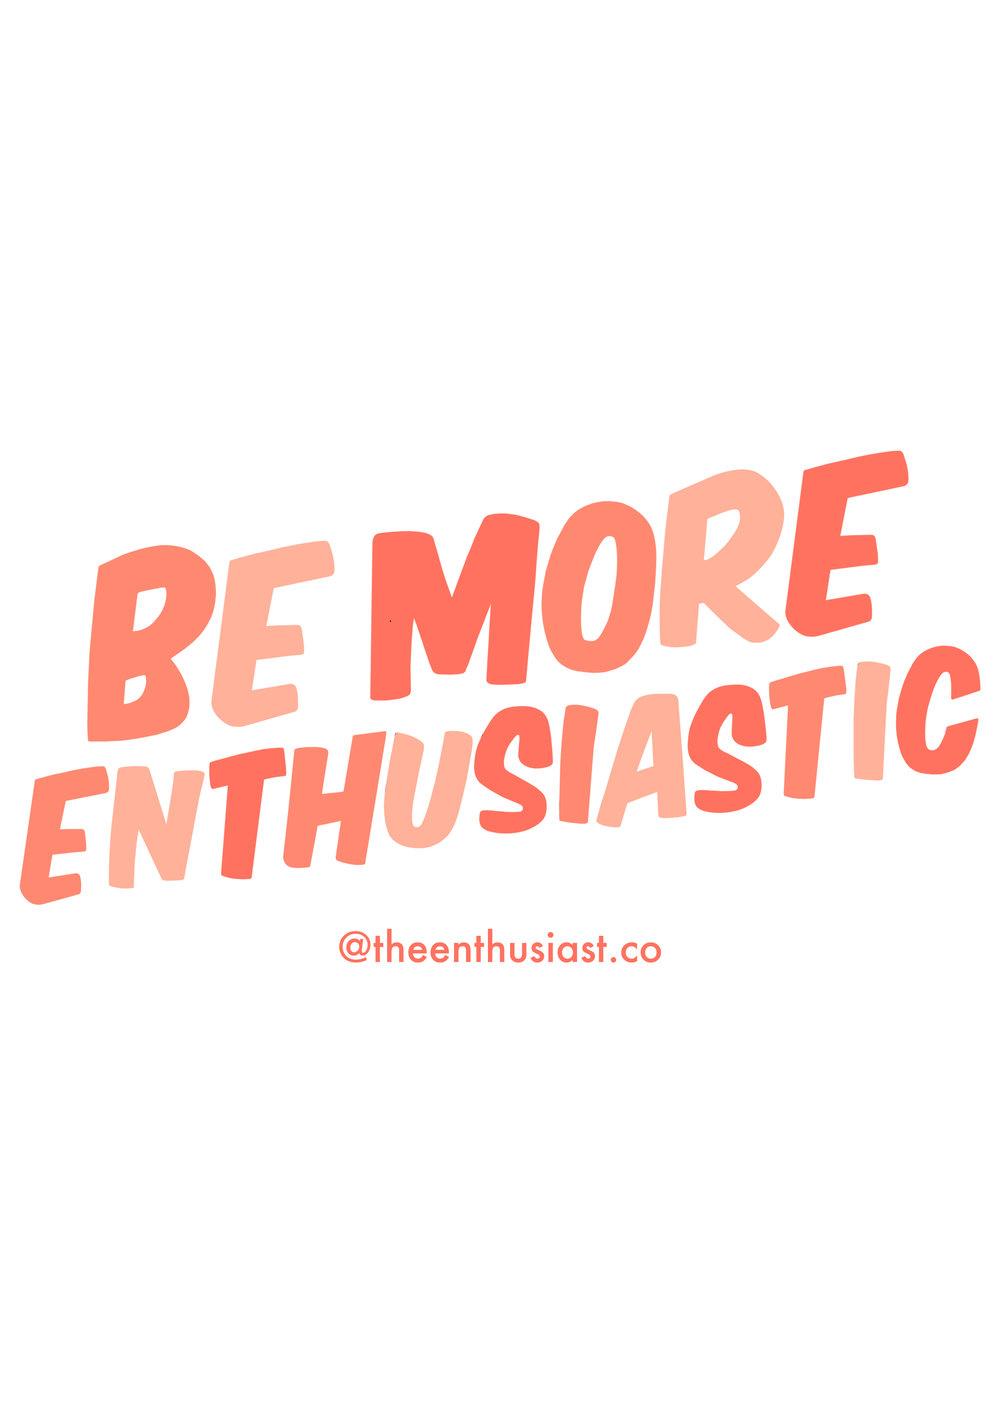 enthusiastic.jpg